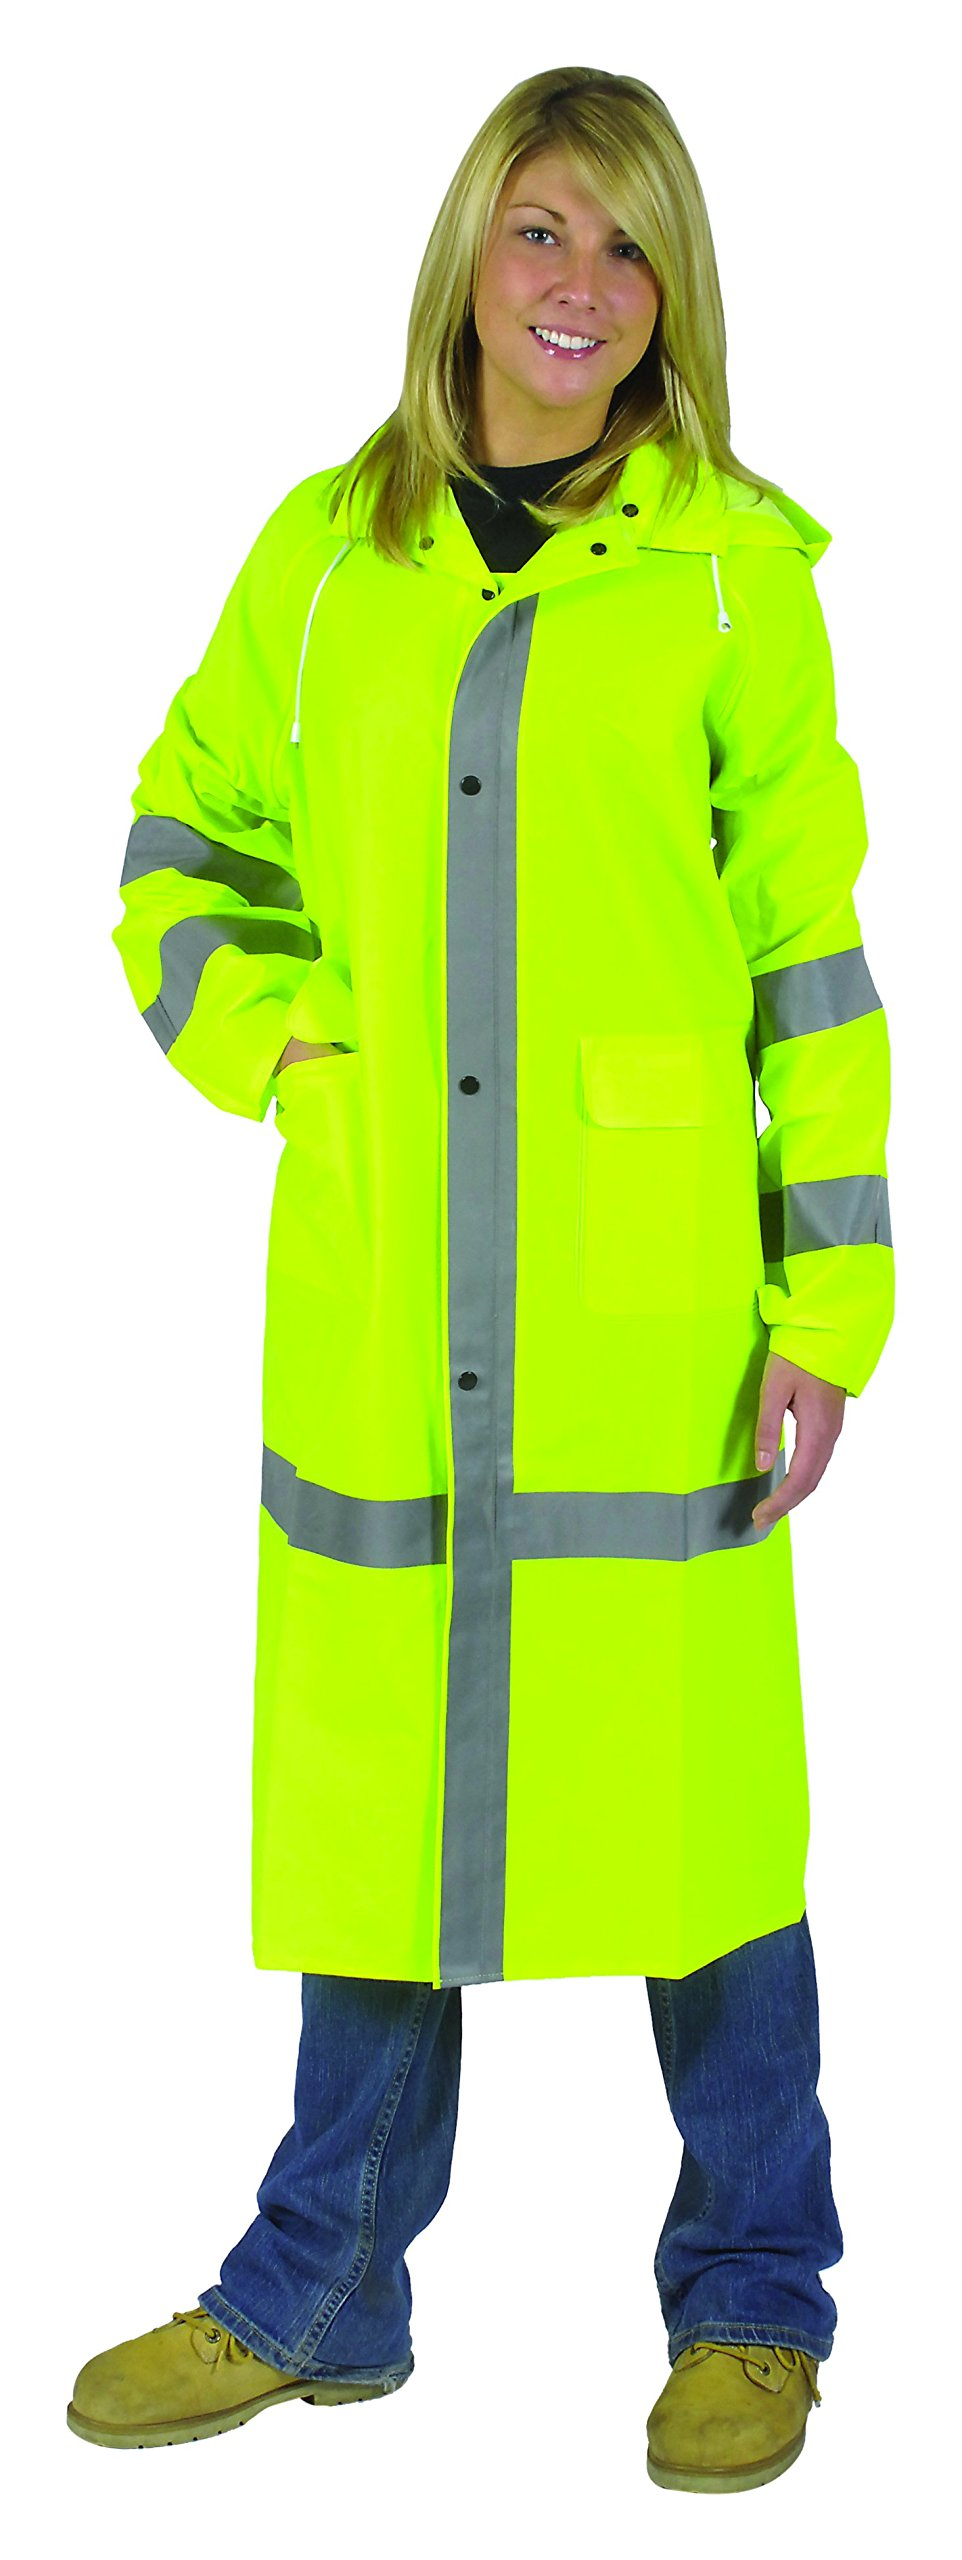 Galeton 8000965-XL-LI 8000965 Repel Rainwear Reflective 0.35 mm PVC Raincoat, 46'' Long, Lime, X-Large